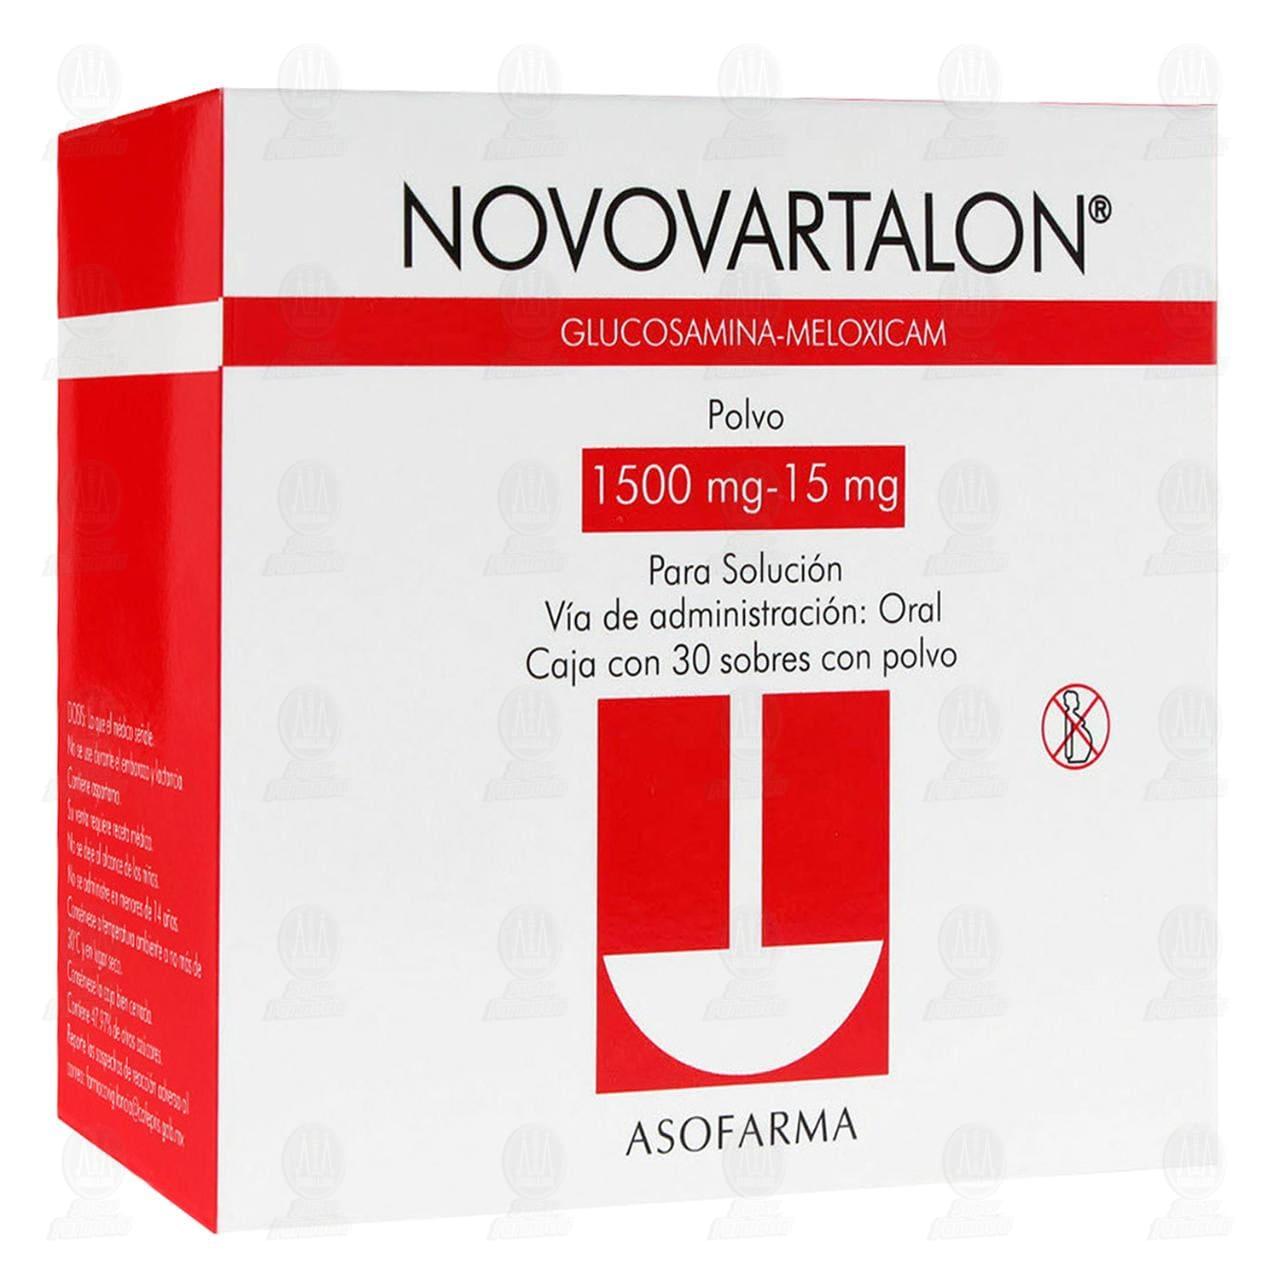 Novovartalon 30 Sobres Polvo